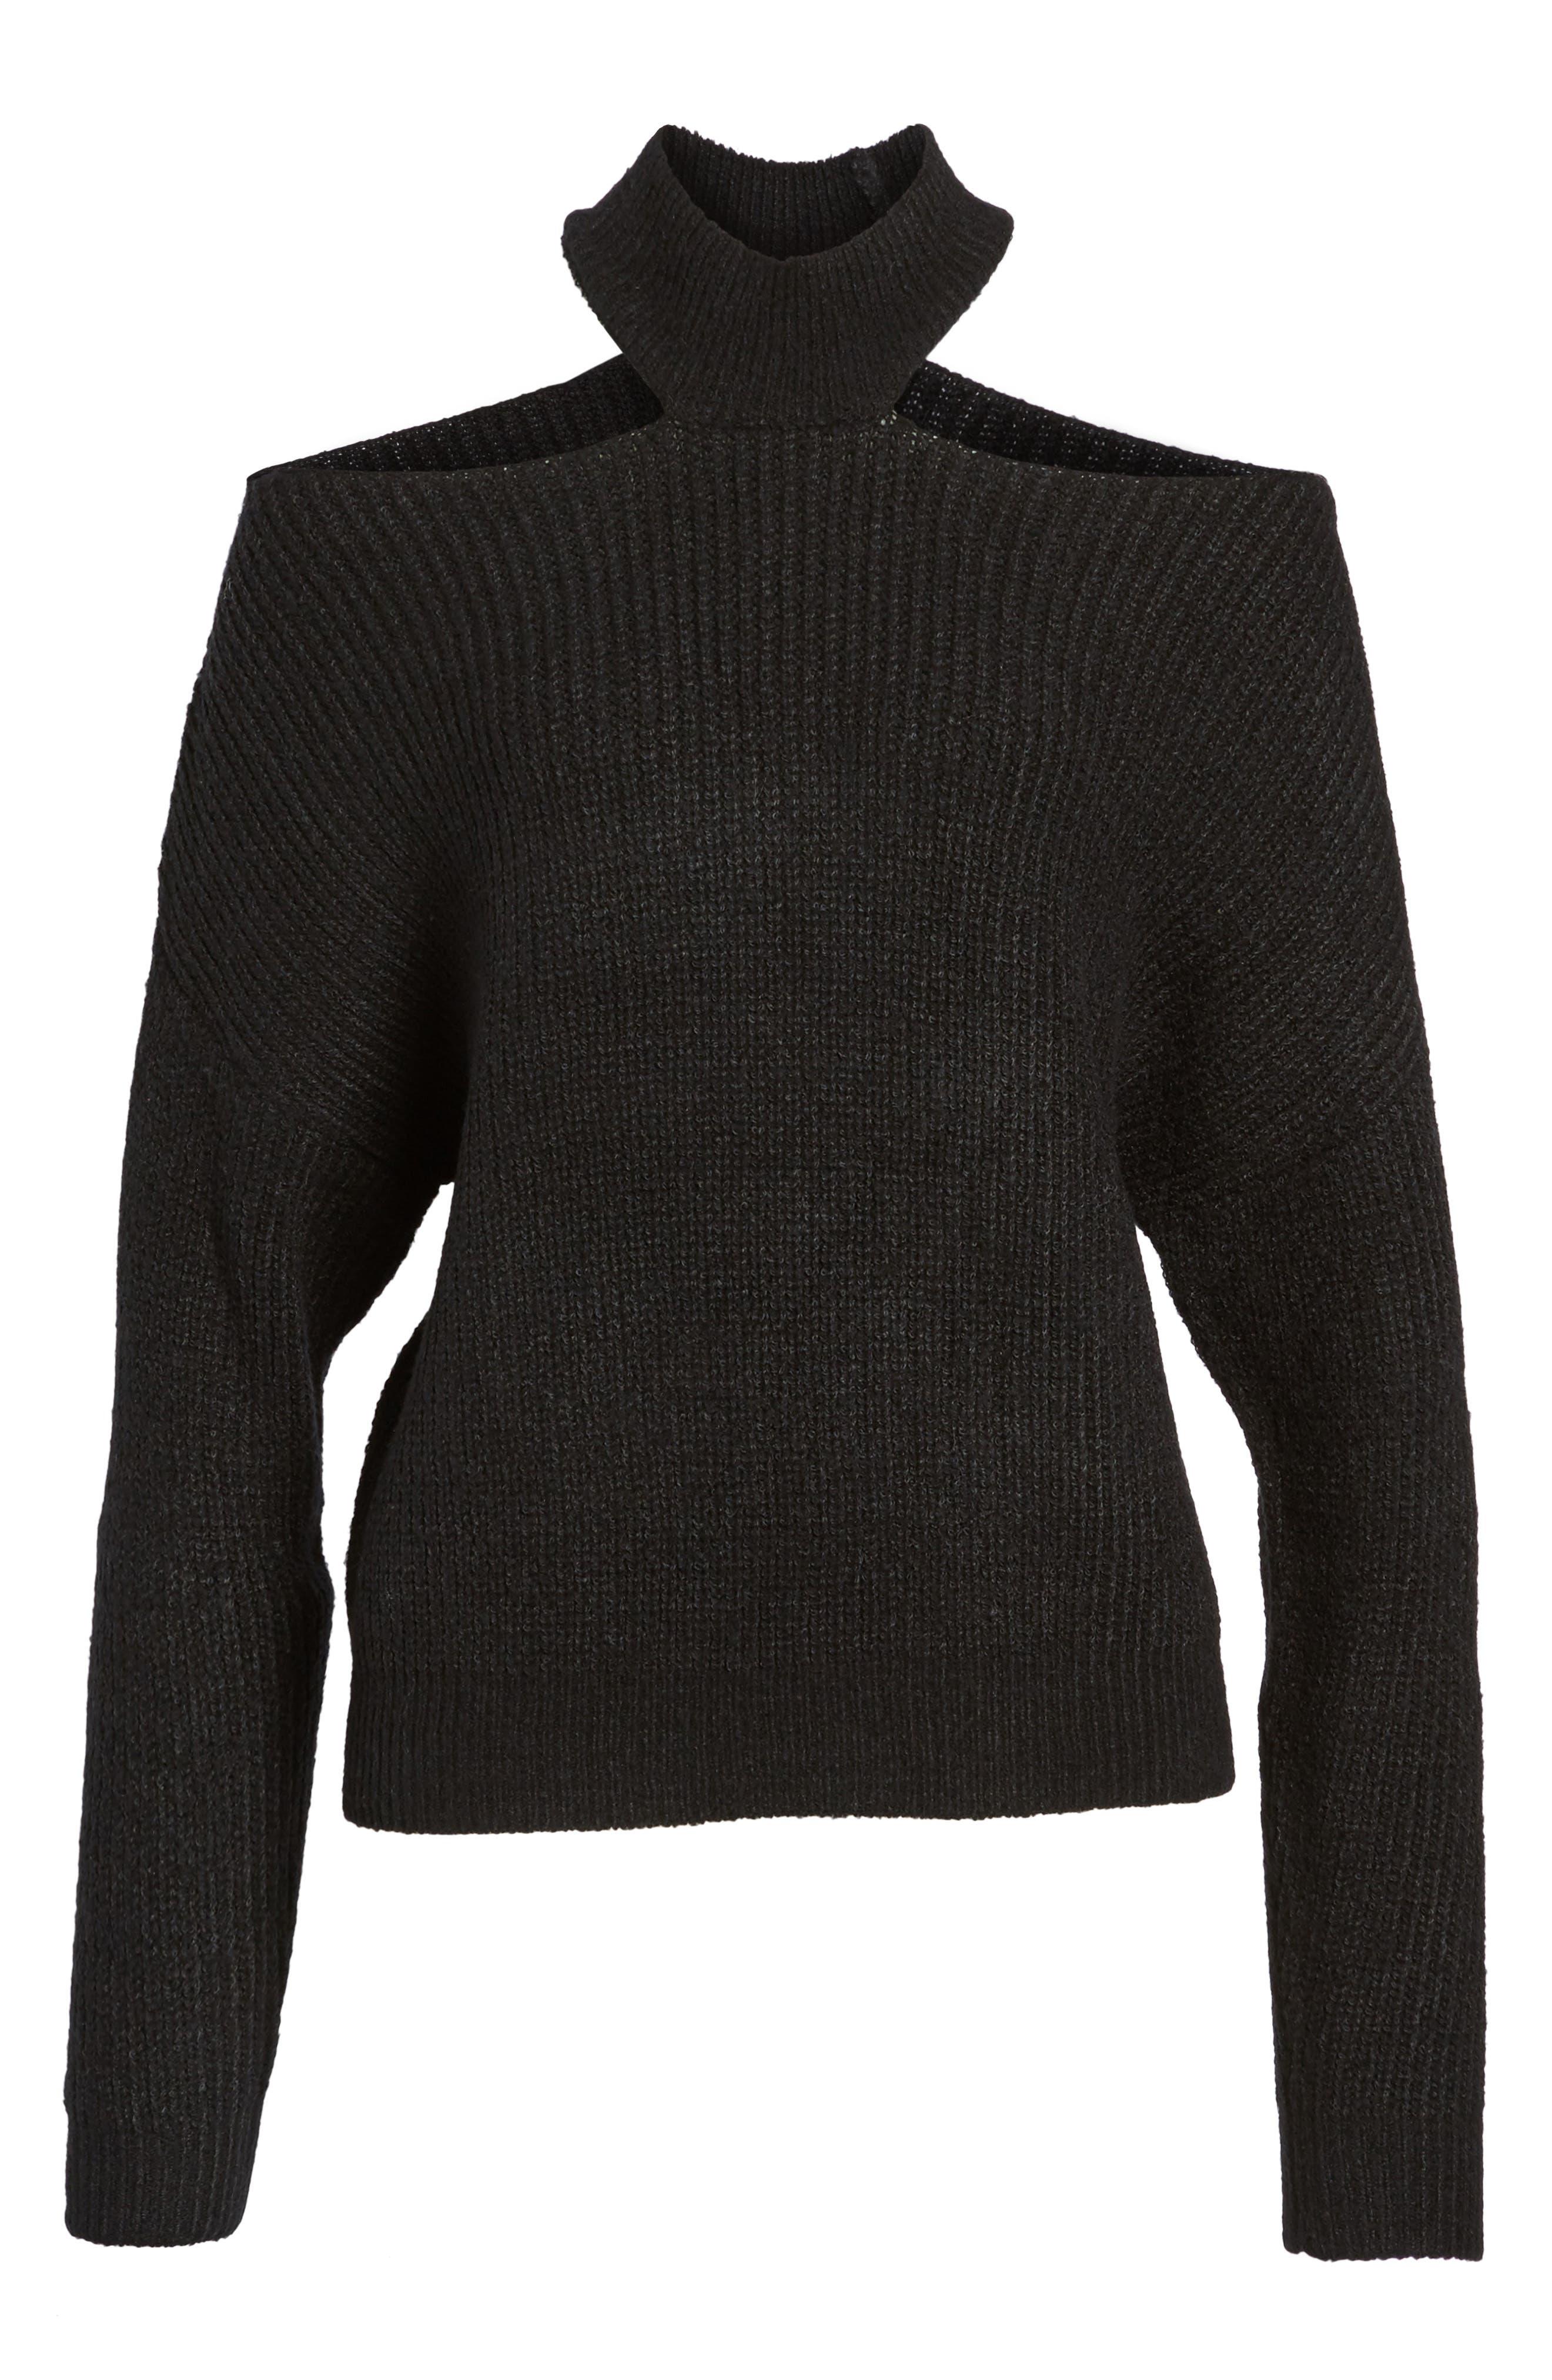 Cutout Turtleneck Sweater,                             Alternate thumbnail 6, color,                             001